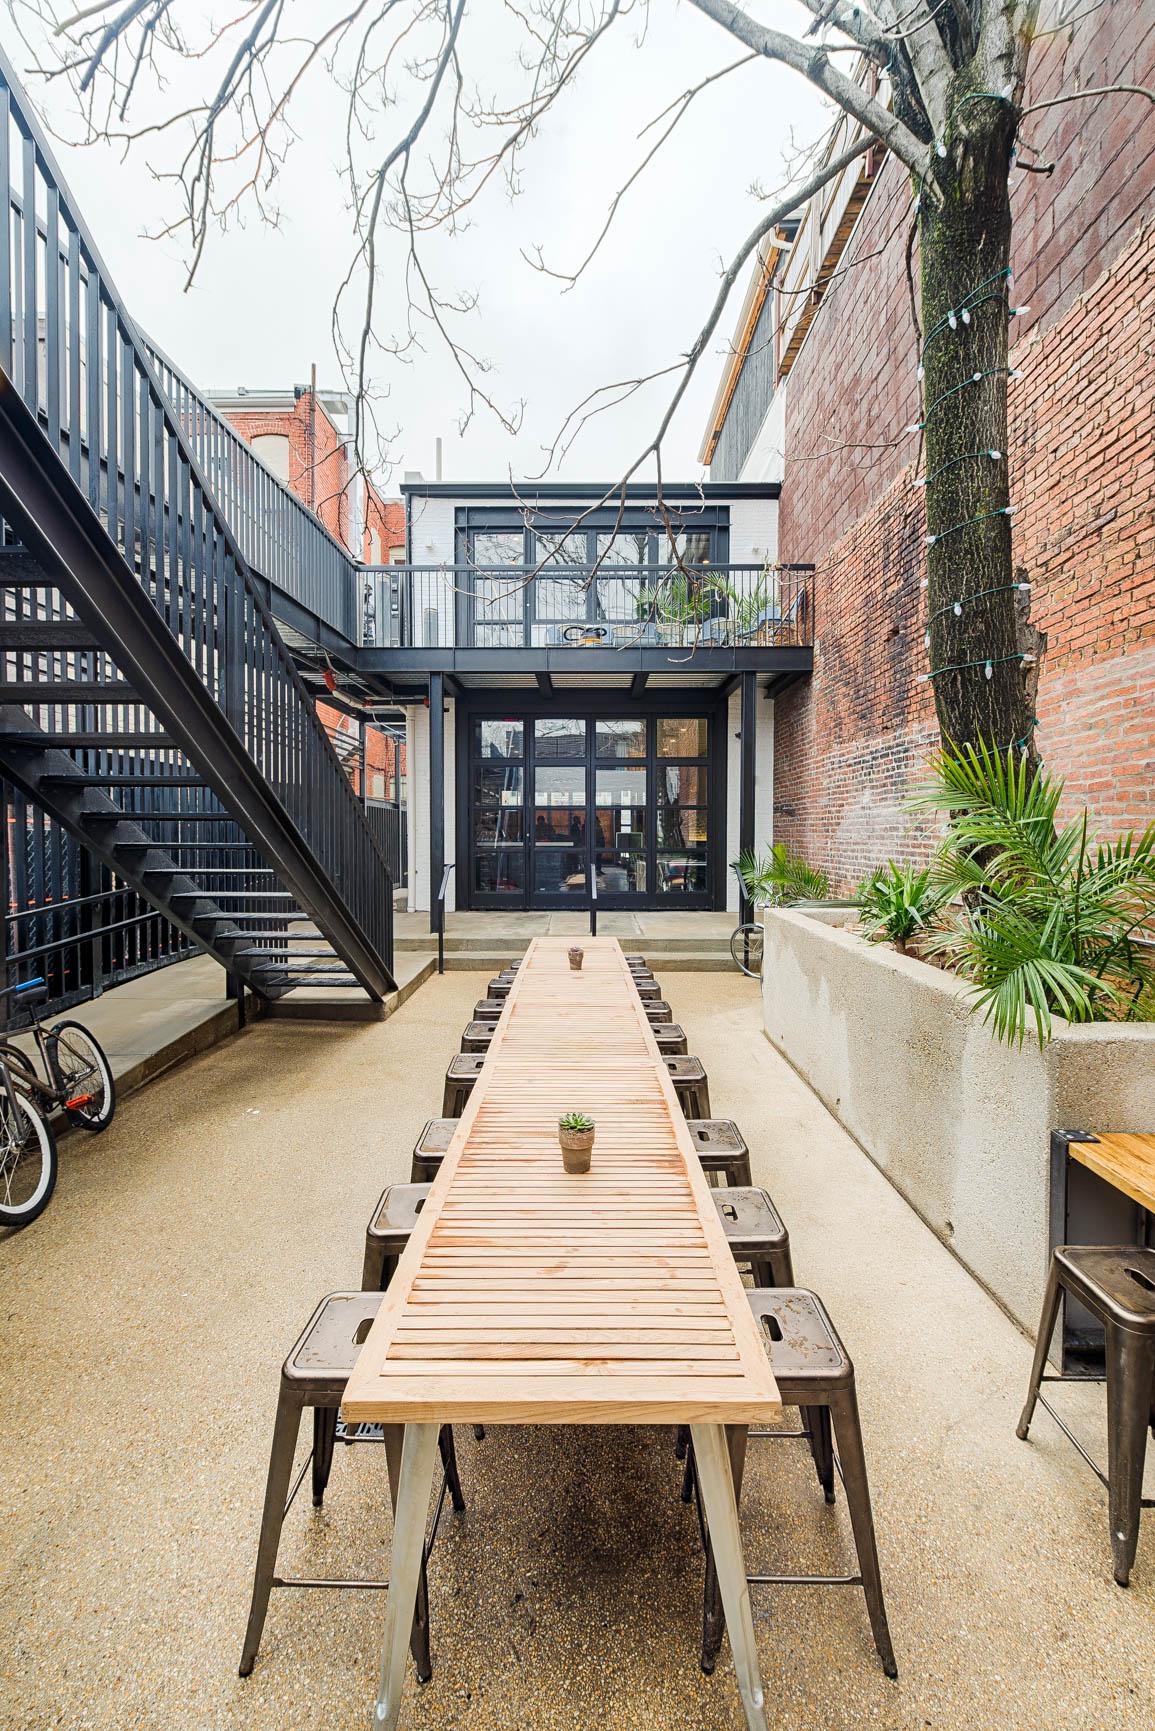 studio-saint-bars-and-restaurants-maketto-washington-dc-3